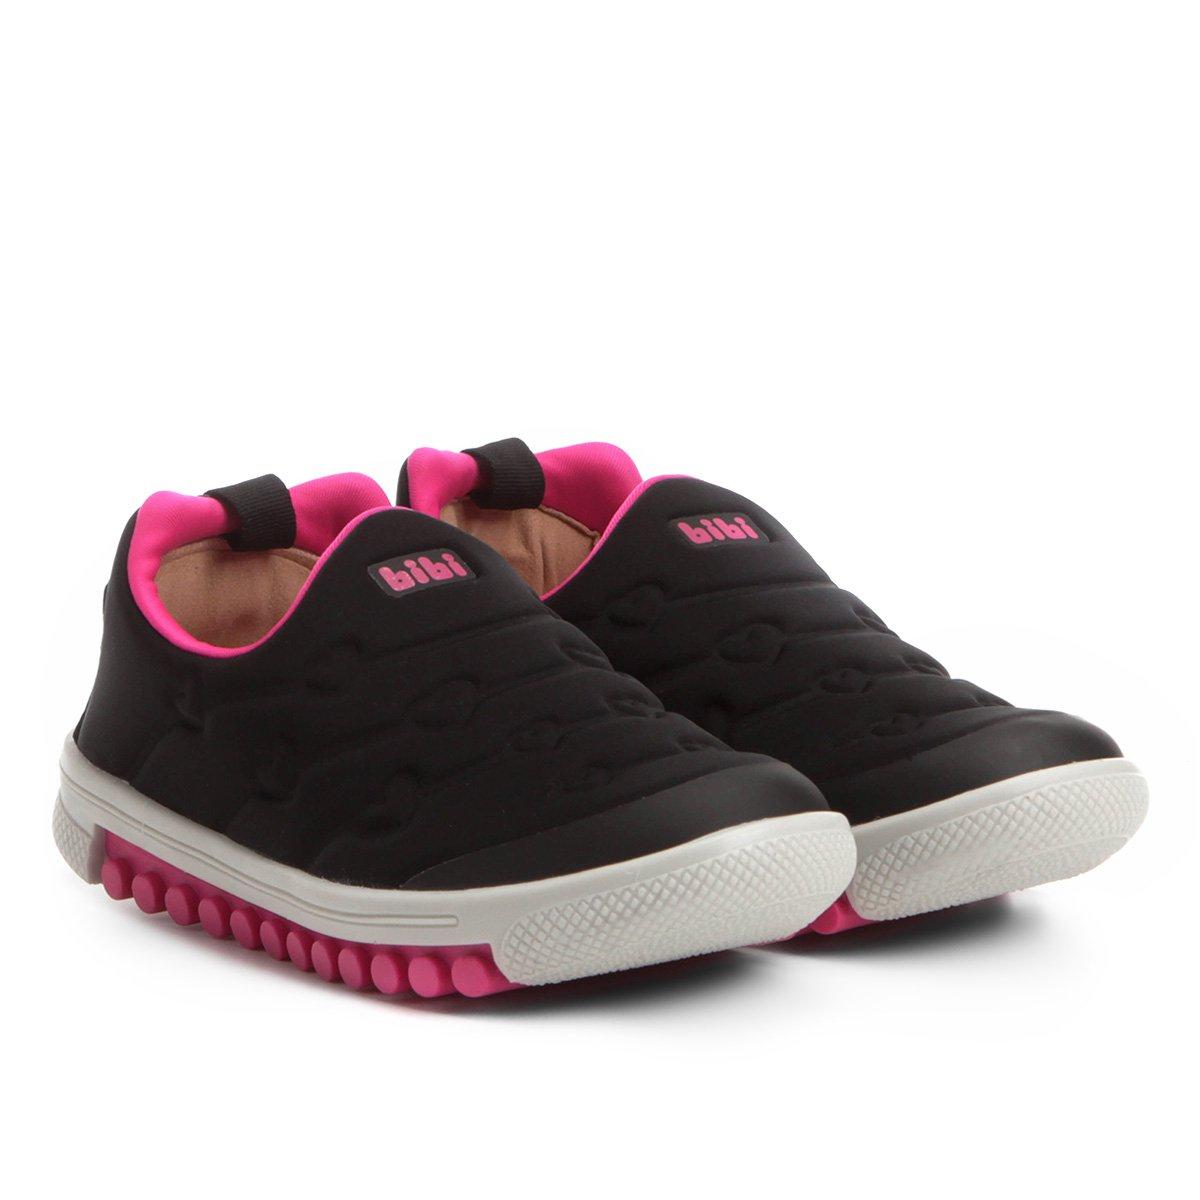 3414b076a1 Tênis Infantil Bibi Roller New Feminino | Netshoes